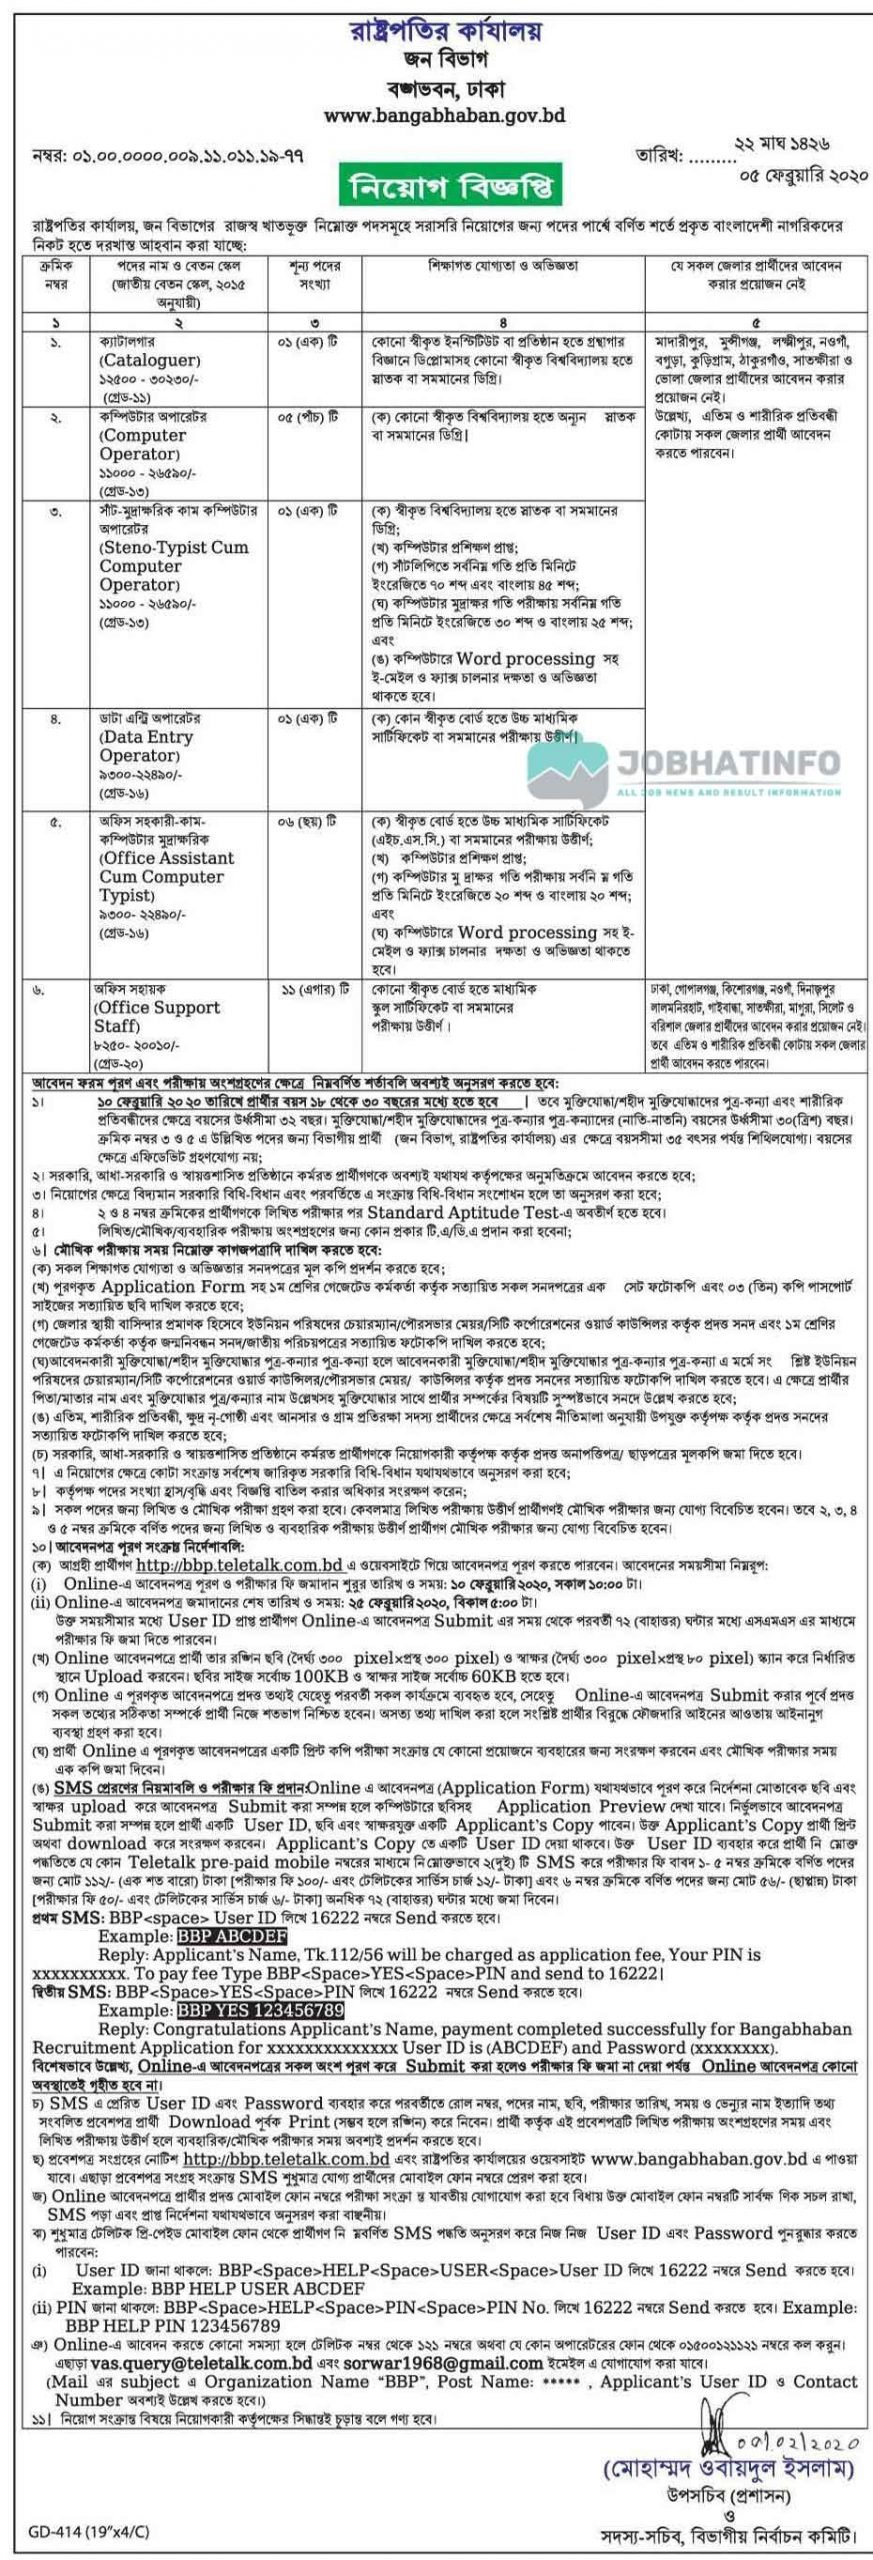 Bangabhaban Job Circular 2020 | Office of the President of Bangladesh | Govt Job Circular 1